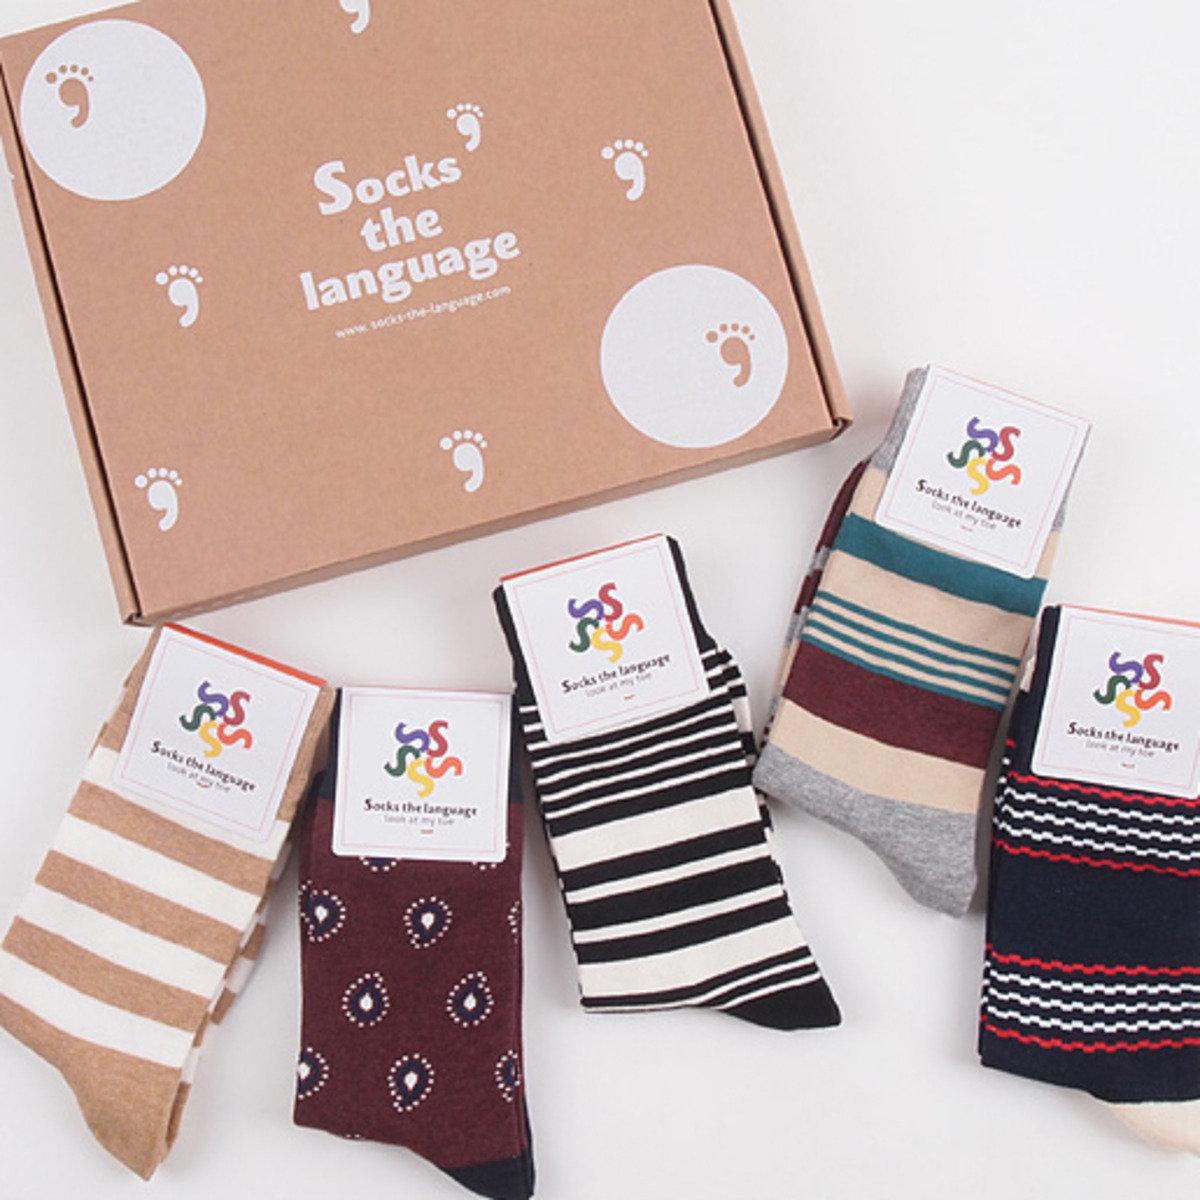 Soft 中筒襪套裝 (5對)_socks_13044